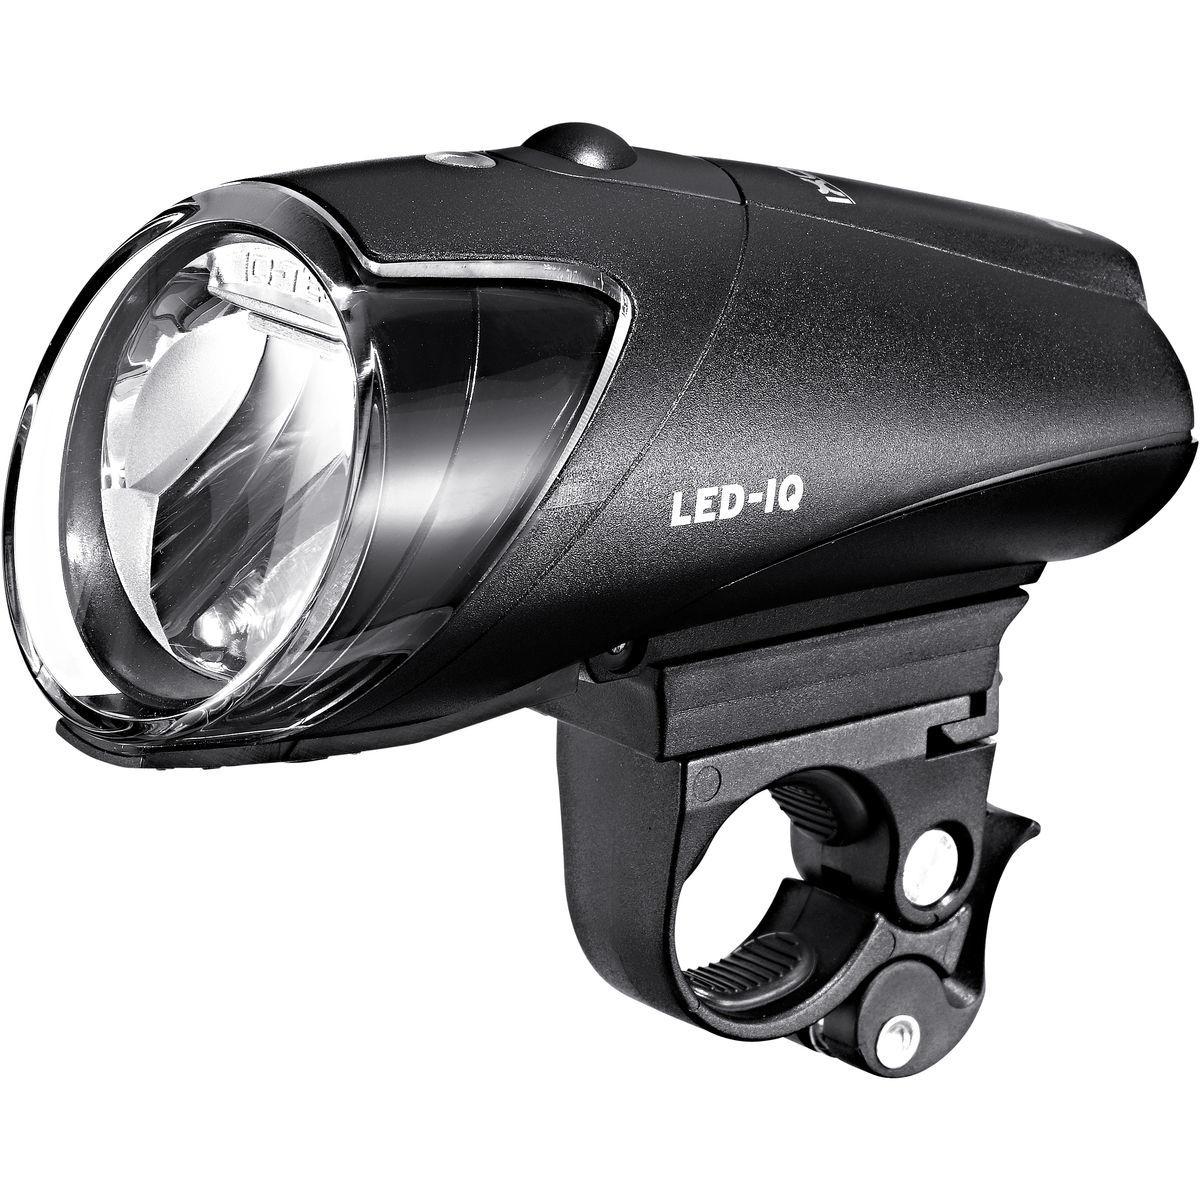 [Karstadt.de] Busch+Müller Ixon IQ, Frontlicht LED, 40 Lux, mit Akkus/Ladegerät für 29,50€ bei Filialabholung